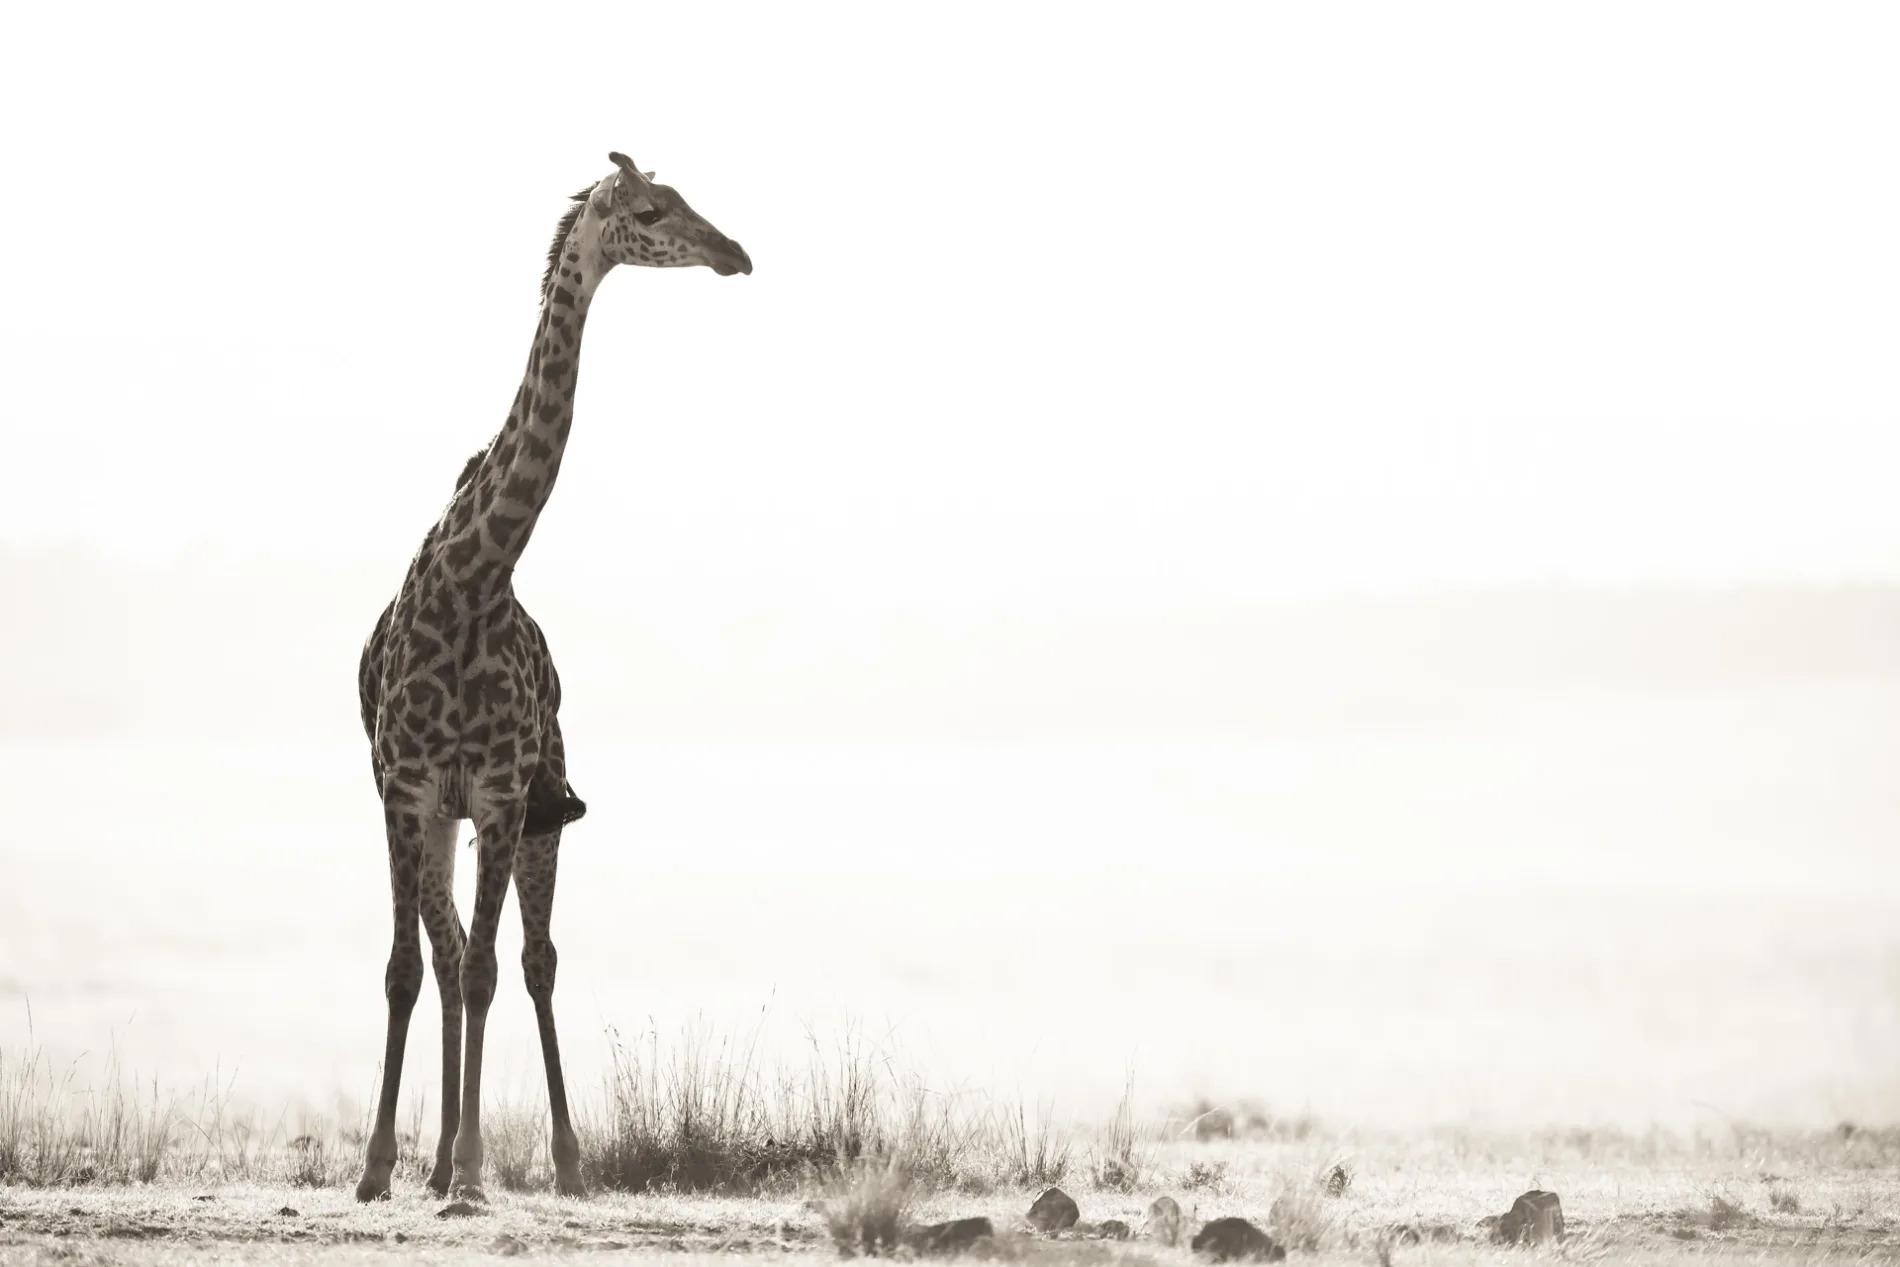 Giraffe gaze into distance